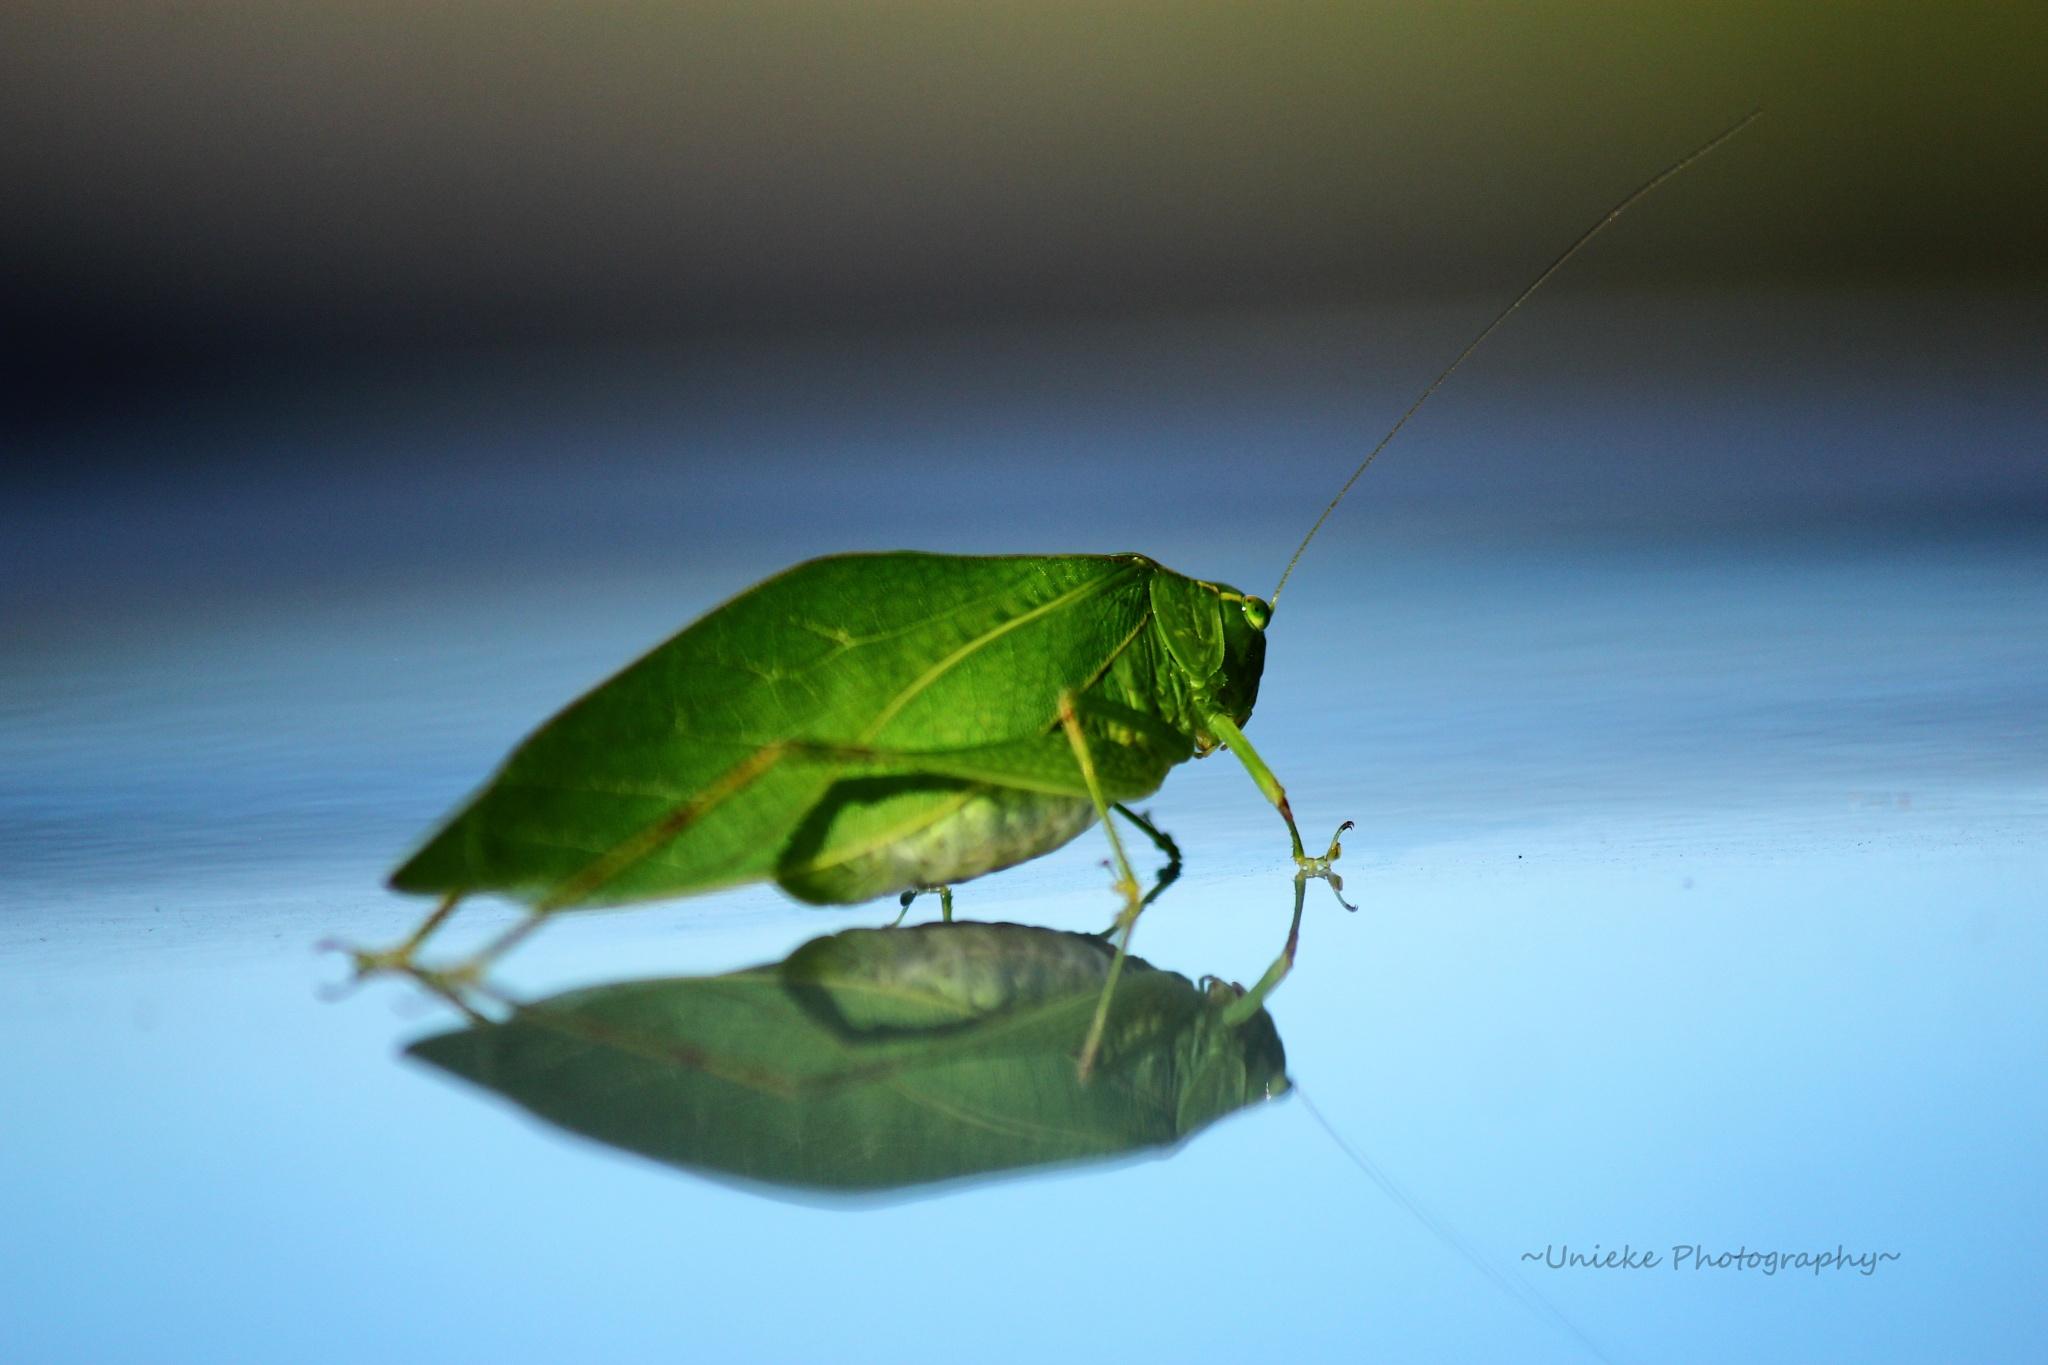 Katydid on Display by ~Unieke Photography~